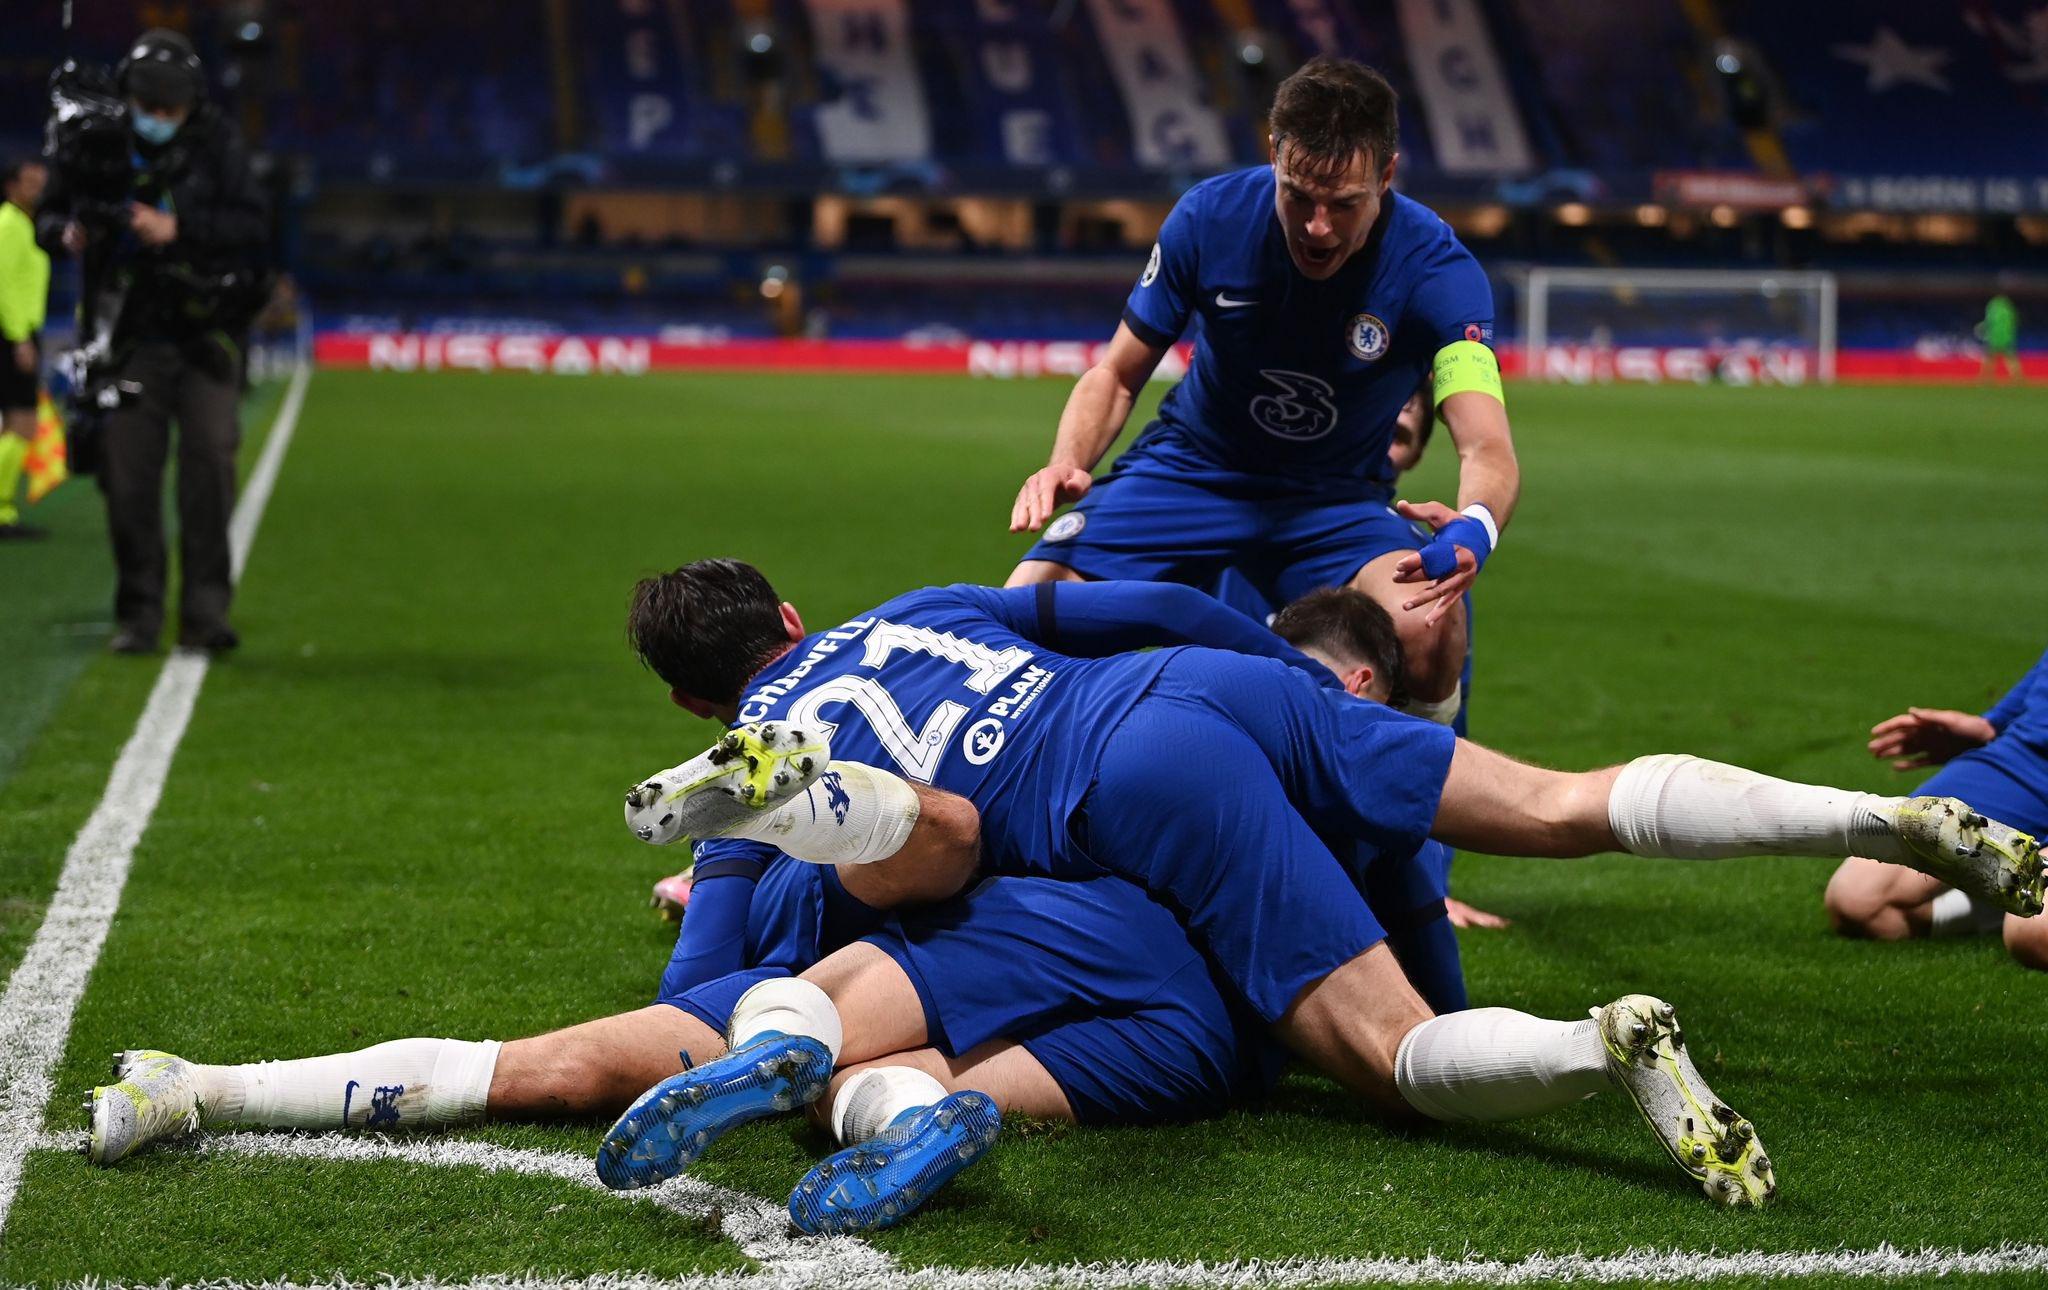 Fabregas & Didier Drogba with joyous reaction as Chelsea reach Champions League final